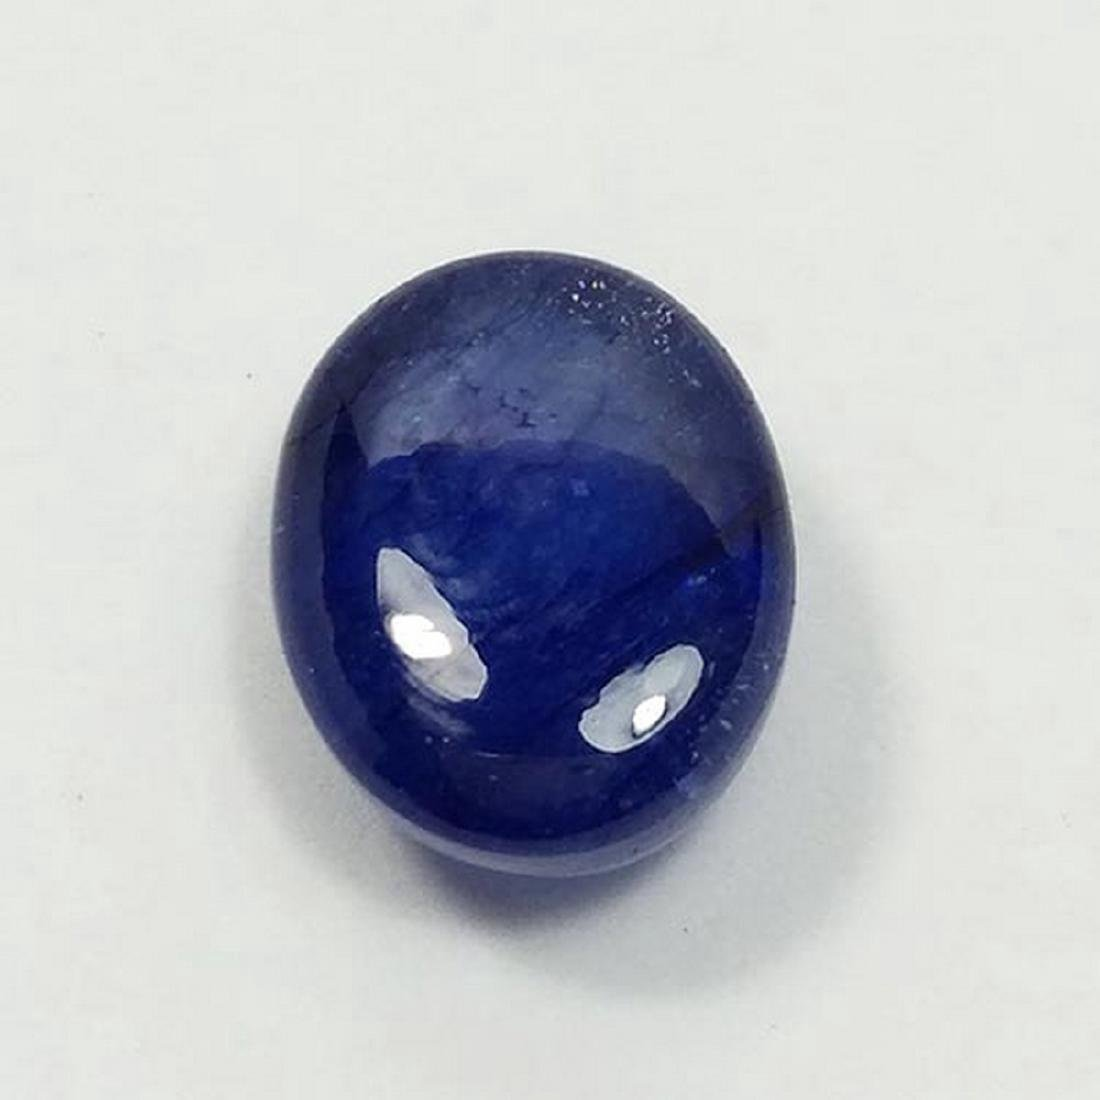 12.30 Carat Loose Blue Madagasgar Sapphire Cabochon